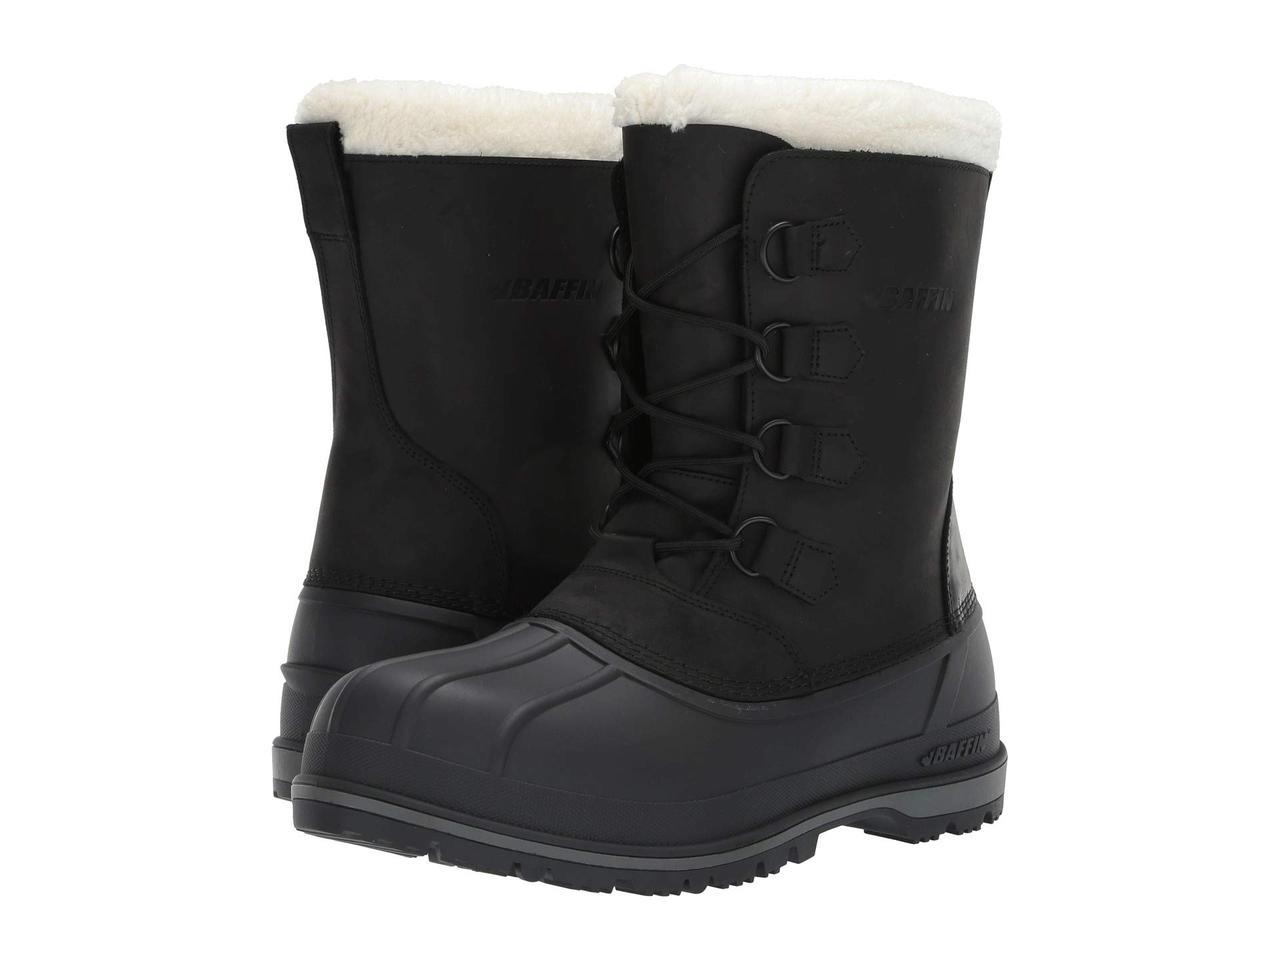 Ботинки/Сапоги (Оригинал) Baffin Canada Black